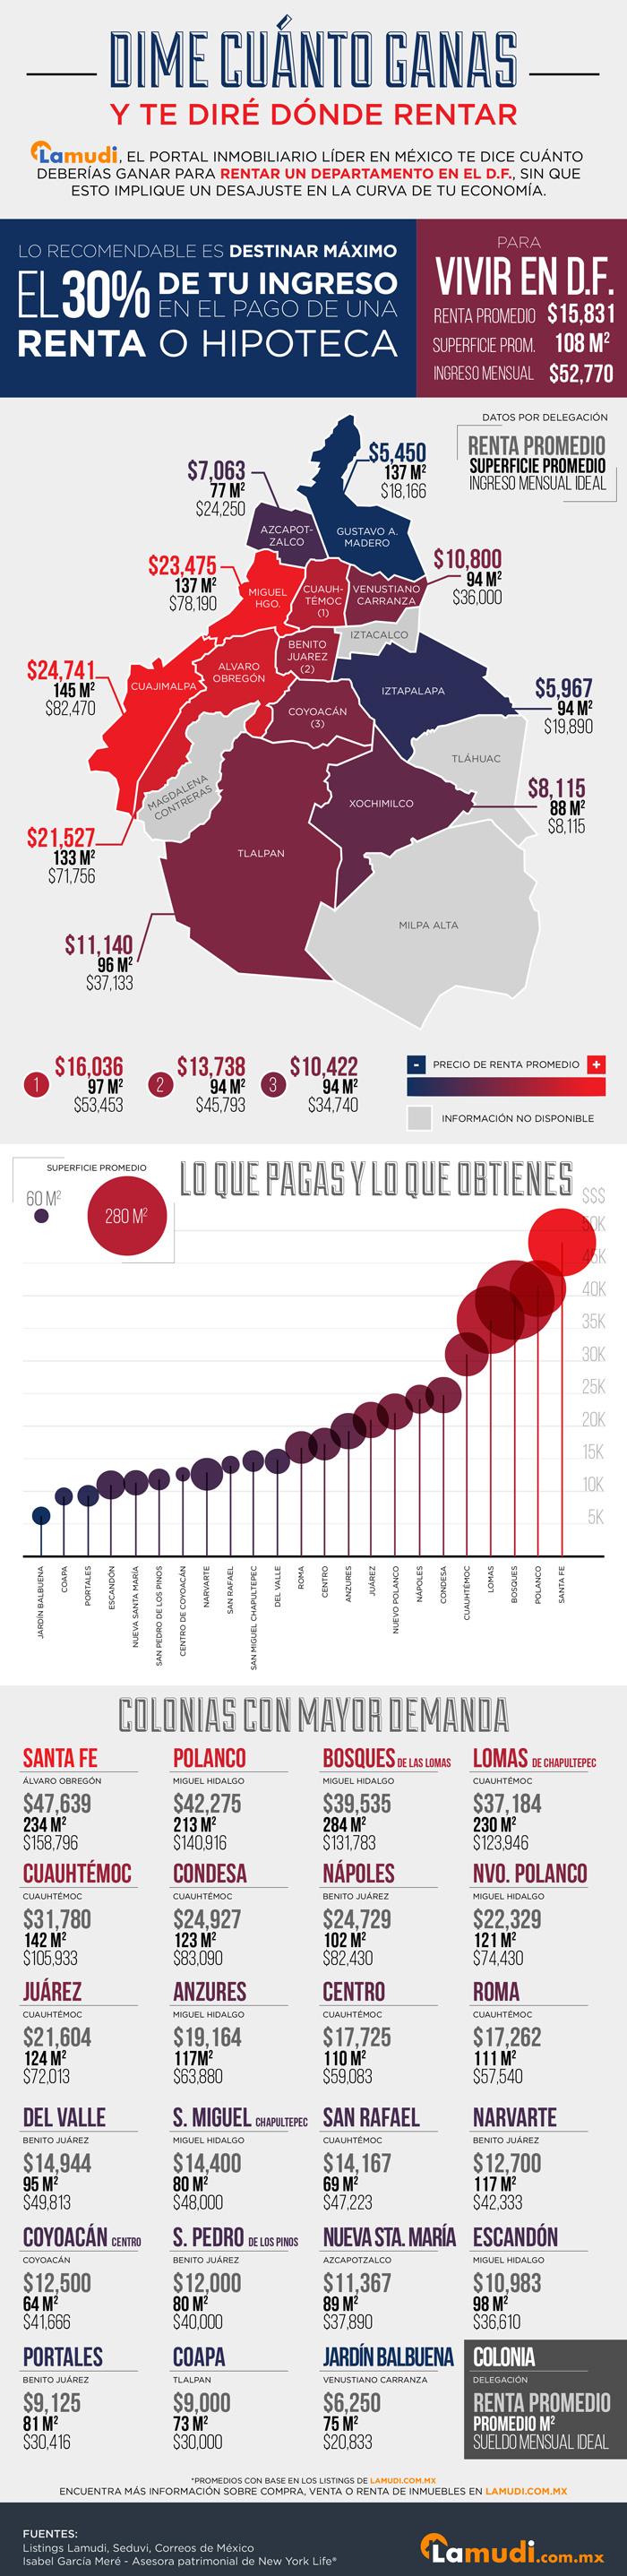 Info-ingreso-renta700px